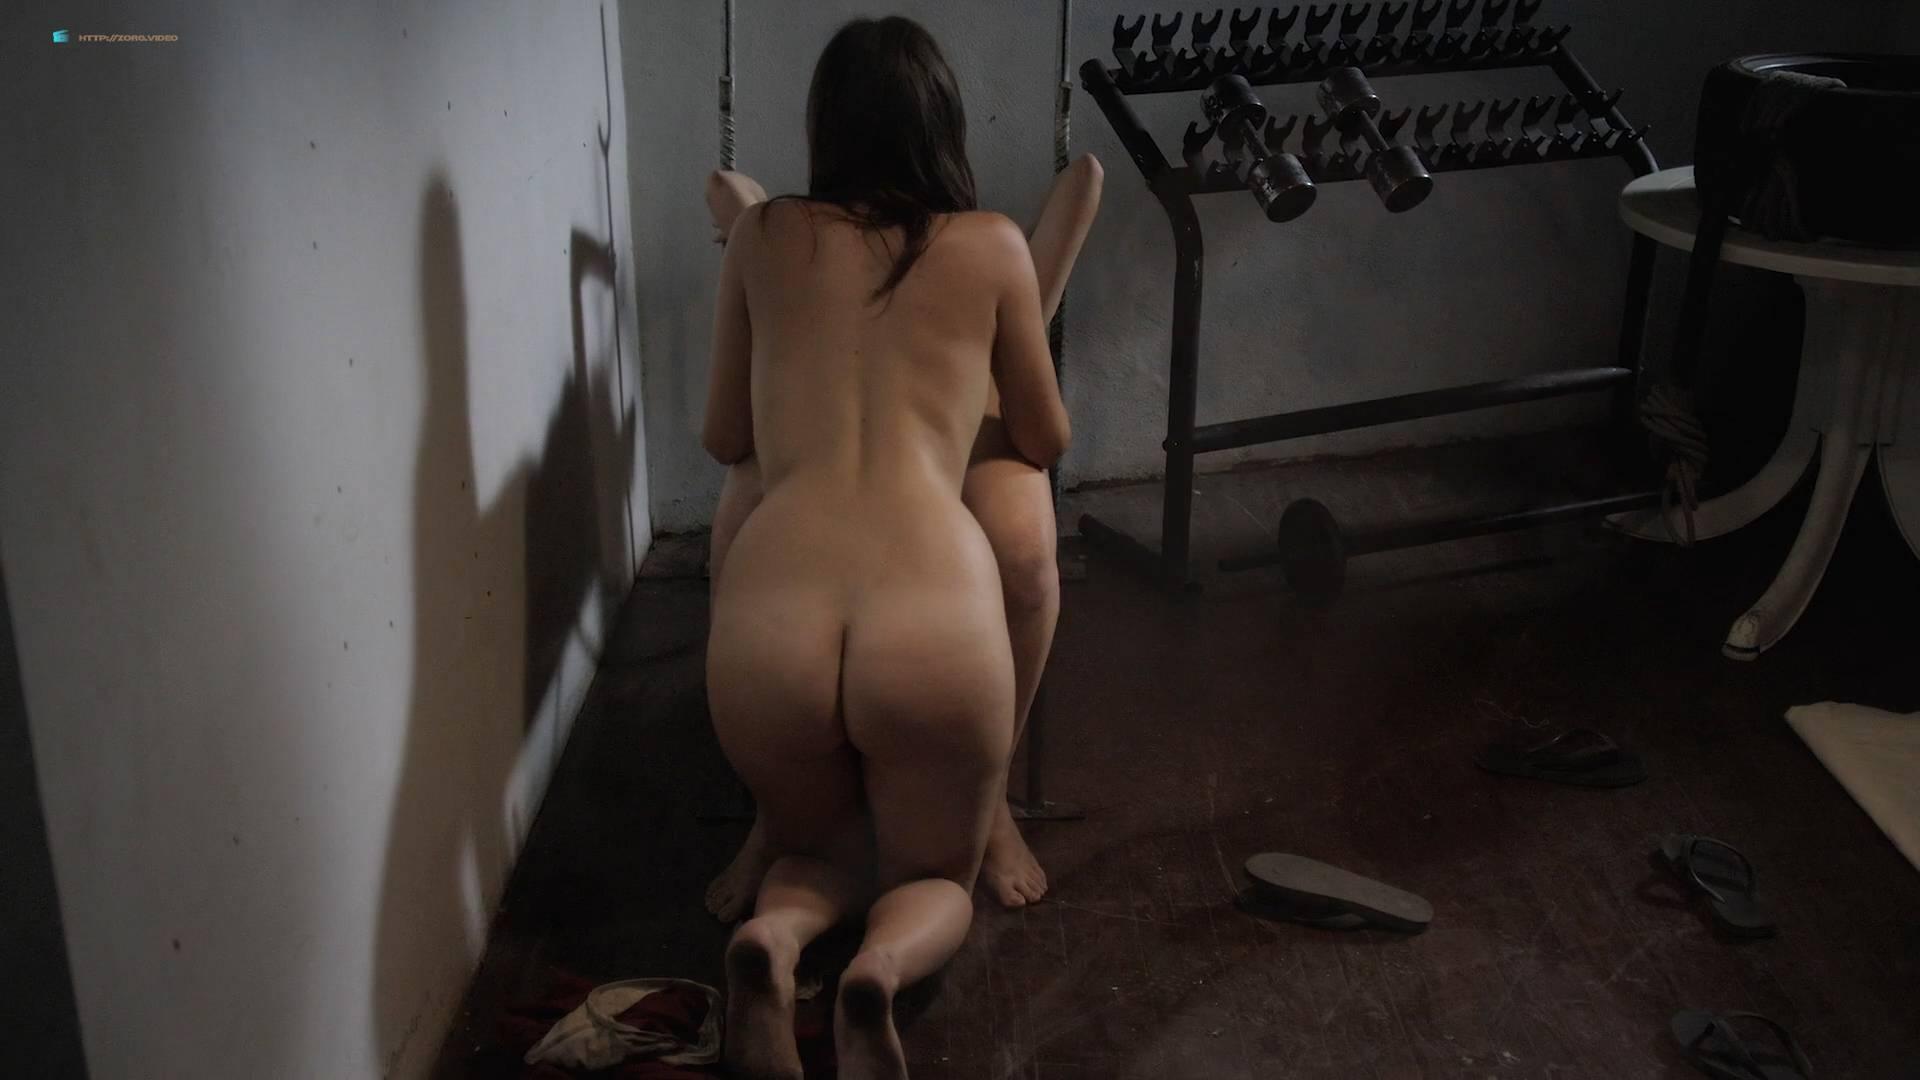 Kelly-McCart-nude-full-frontal-Katrina-Grey-nude-lesbian-sex-Locked-Up-2017-HD-1080p-Web-017.jpg